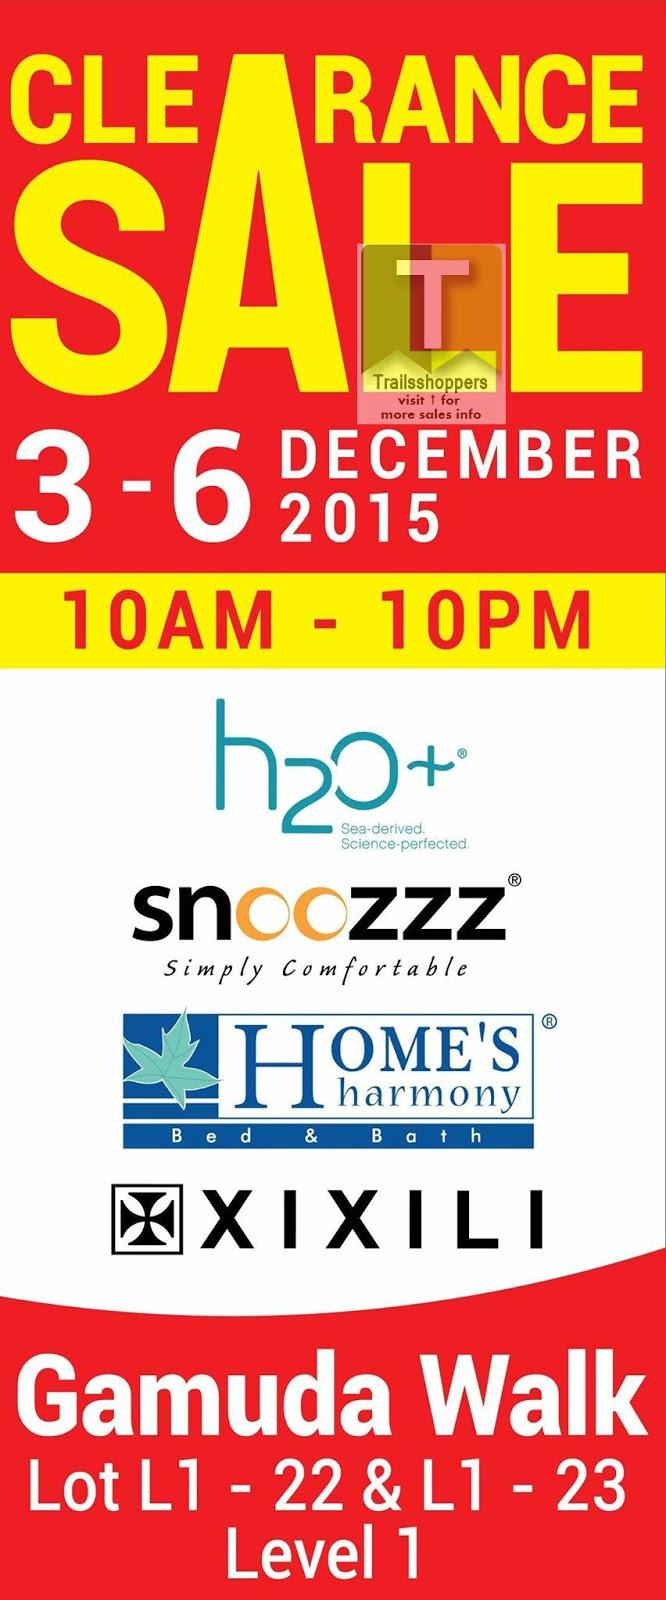 Homes Harmony Xixili Clearance Sale 2015 Malaysia